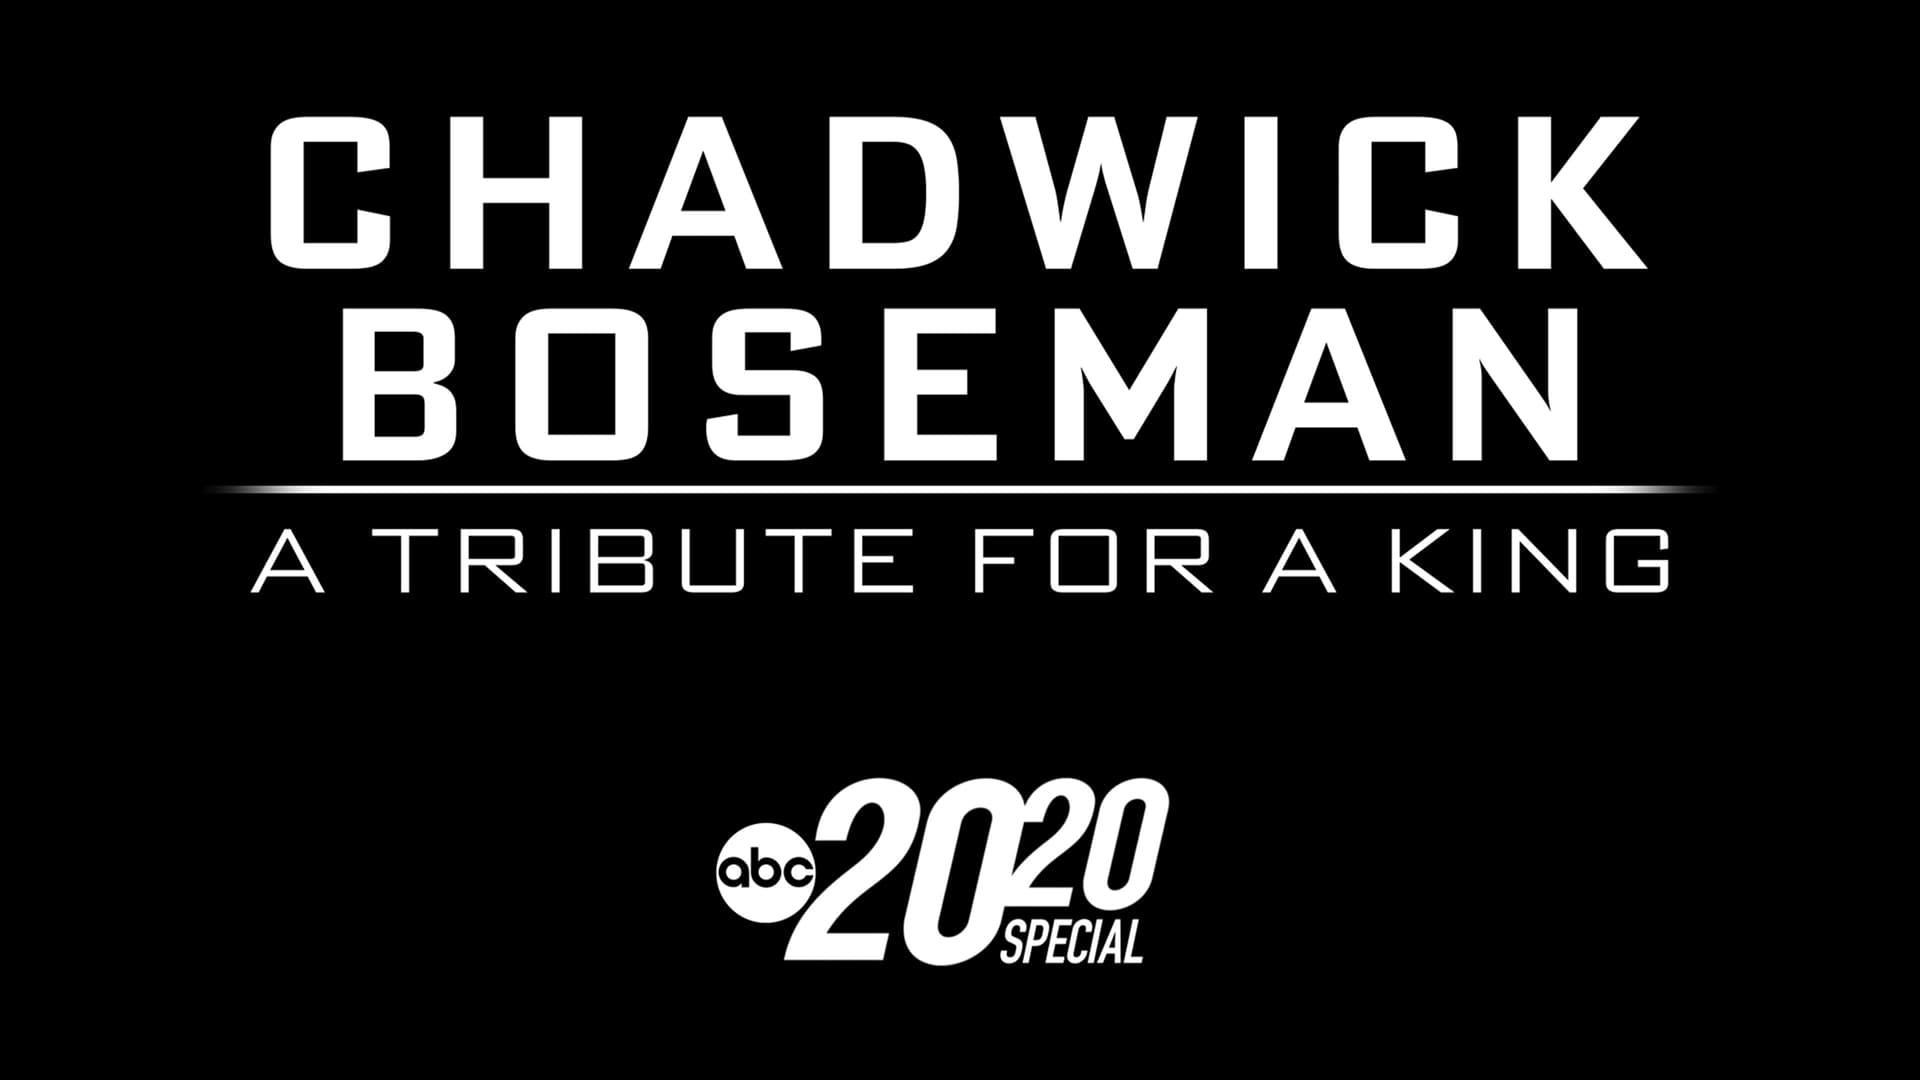 Chadwick Boseman - A Tribute for A King